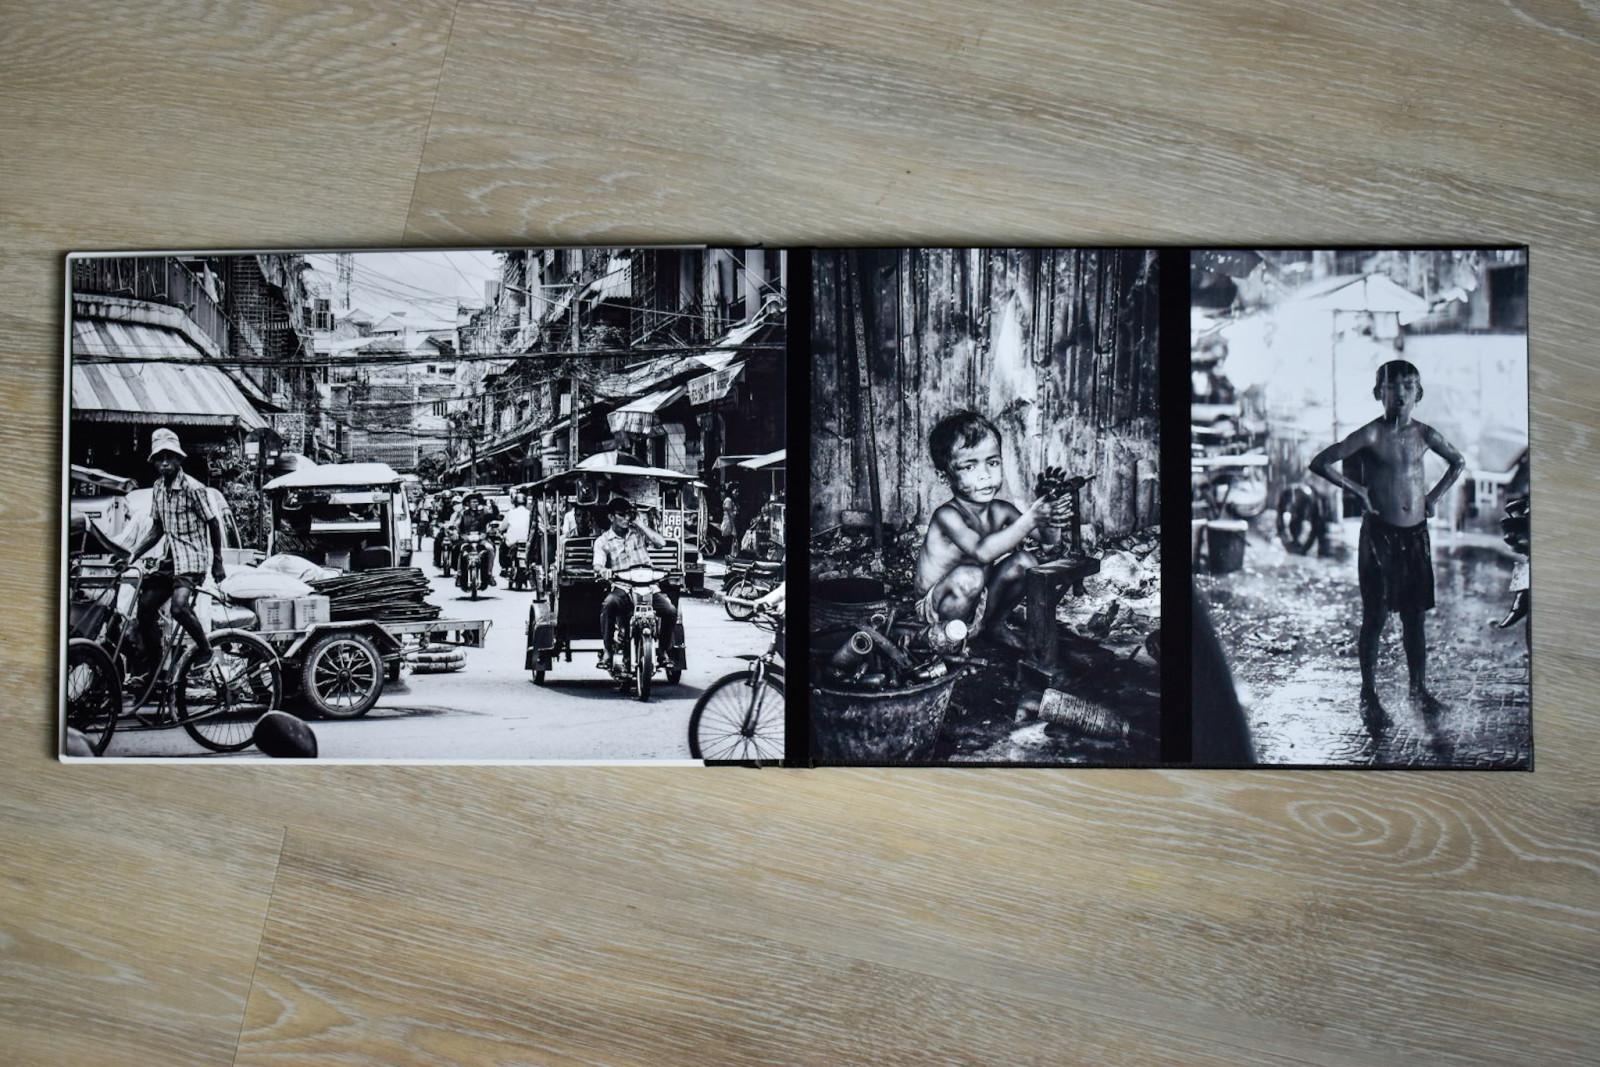 saal-digitaal-klinkhamer-noir-cambodia-street-life